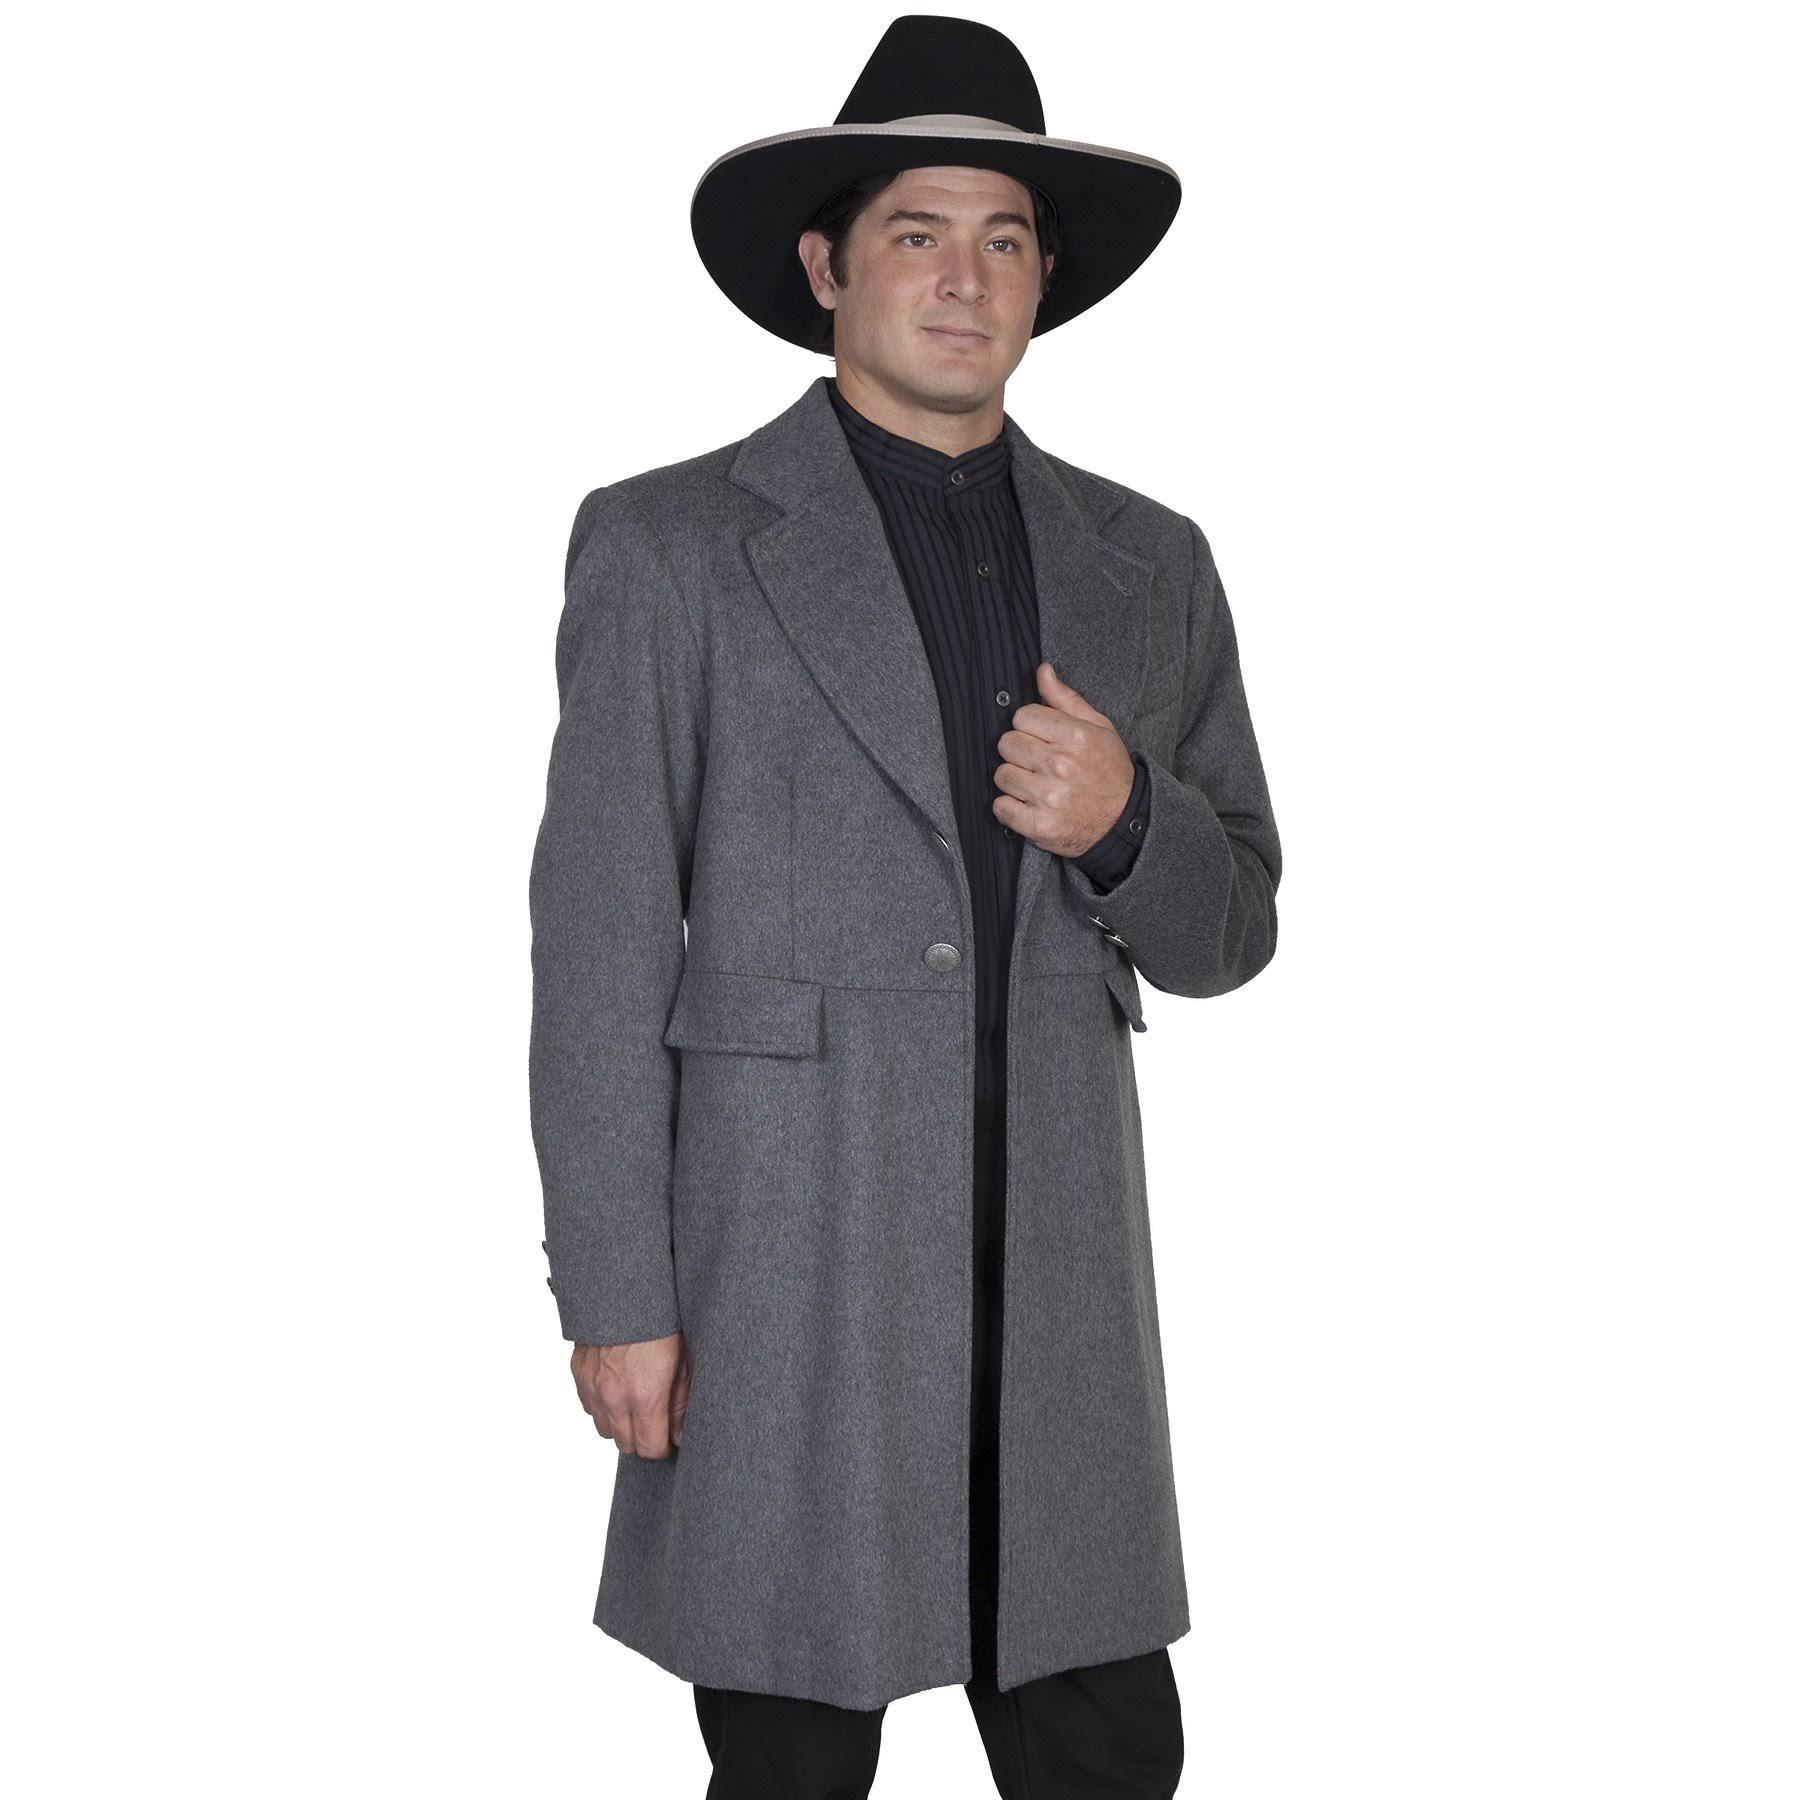 Scully Poliéster 520929 Vestido Lana Regular Charcoal Western Coat Botón Hombre RW0qrRIg